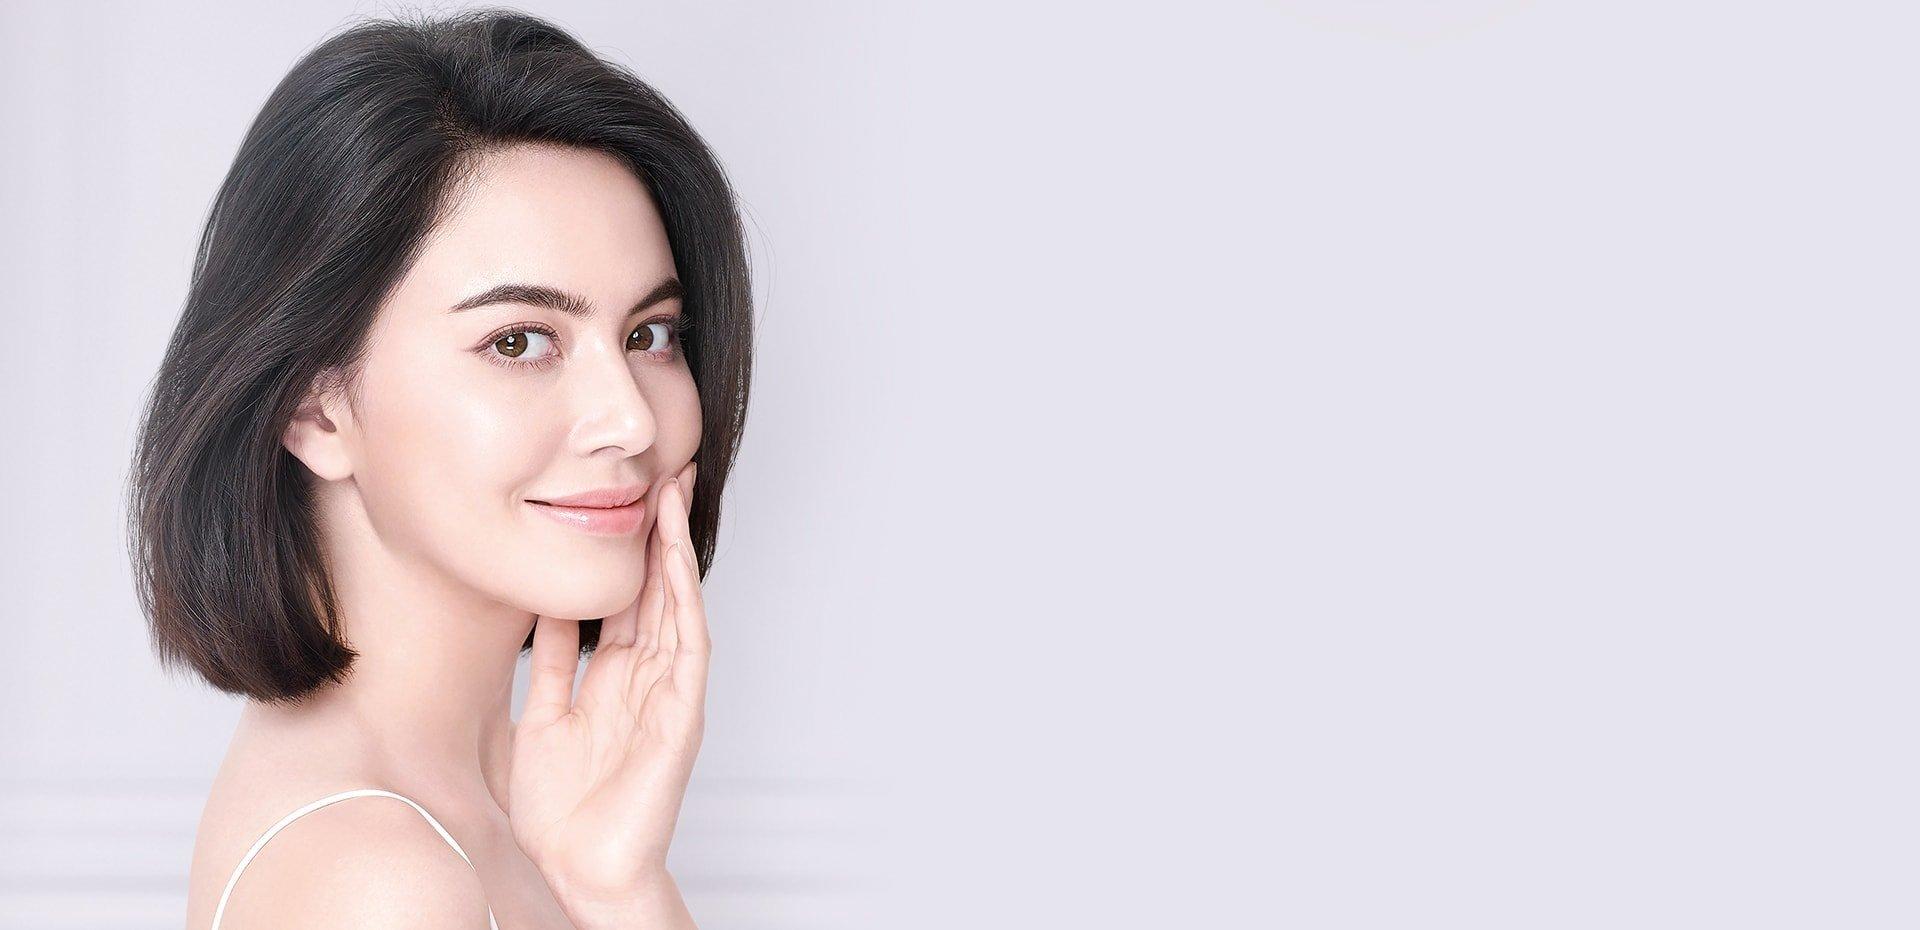 Skin Care Powder